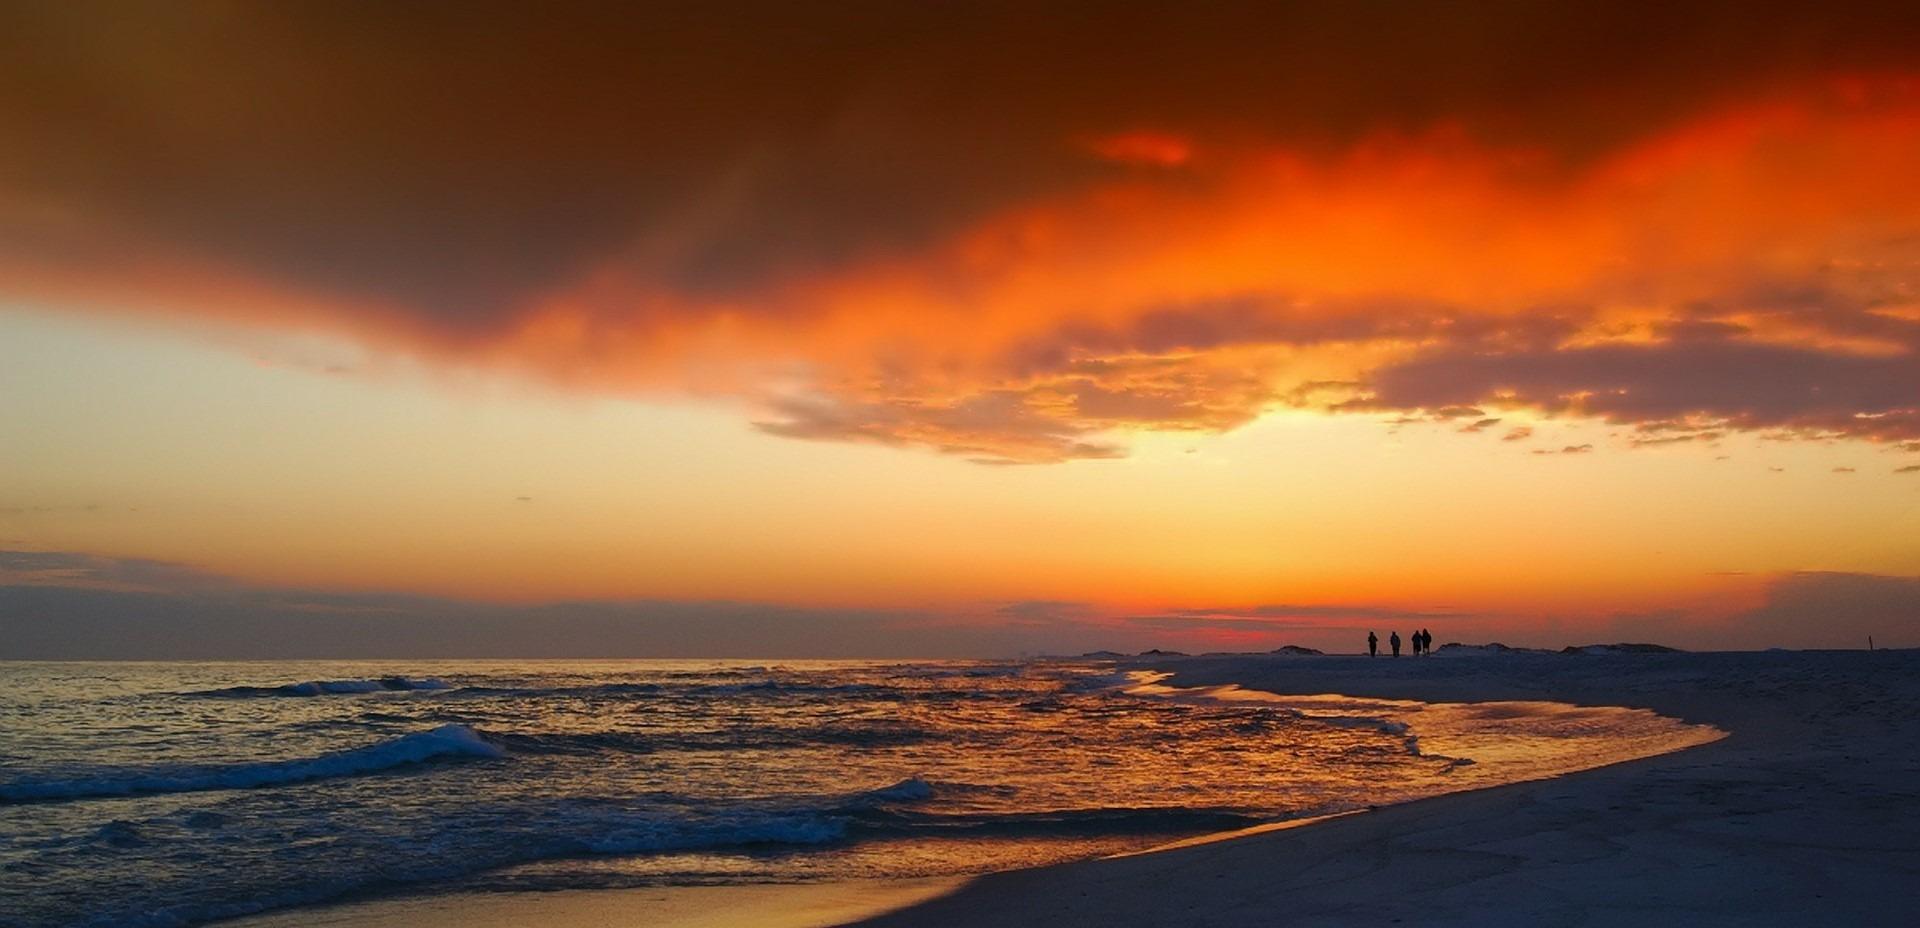 Sunset in Clewiston, Florida - GoodwillCarDonation.org